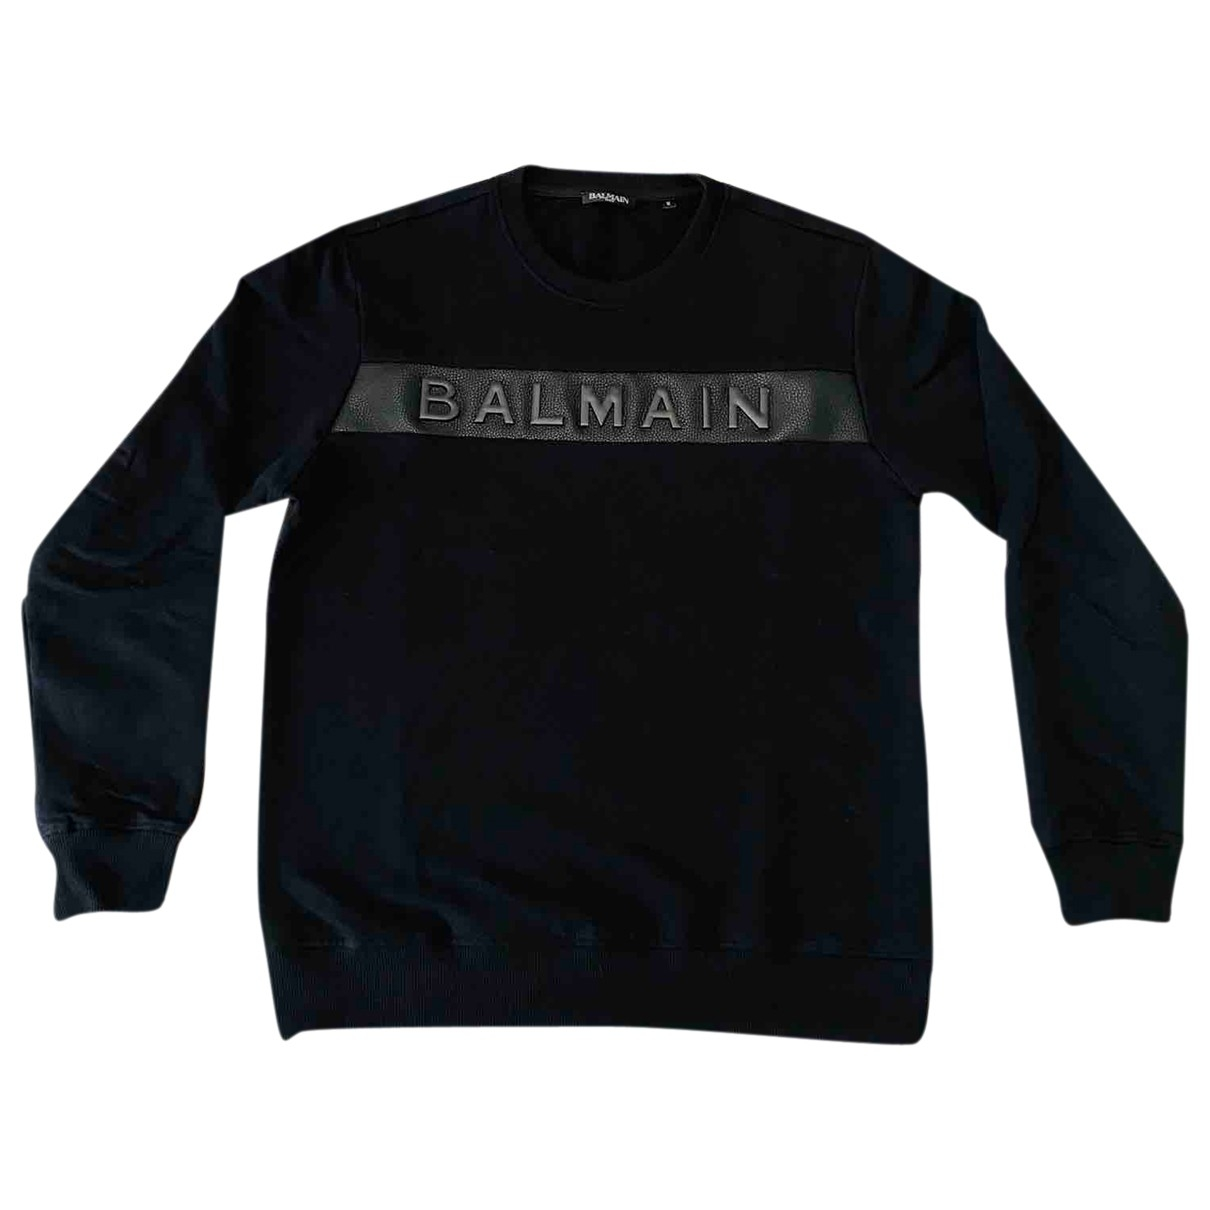 Balmain \N Black Cotton Knitwear & Sweatshirts for Men M International